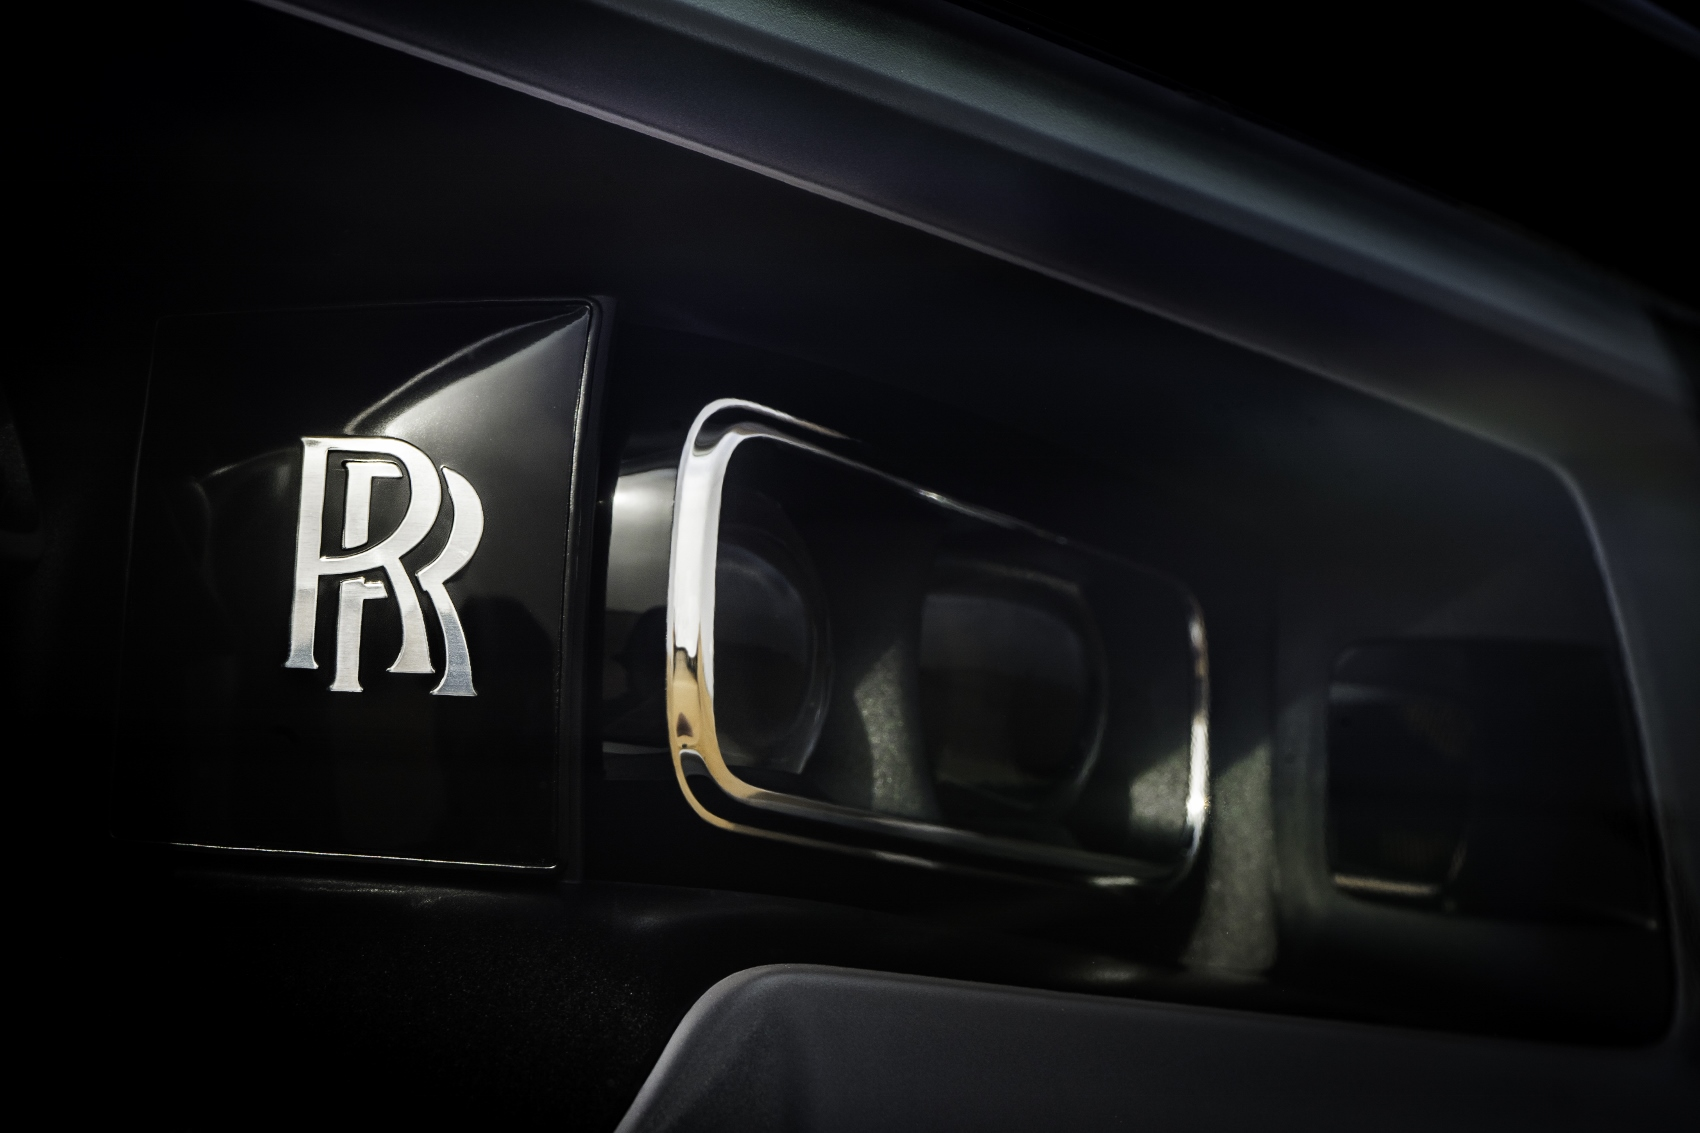 Rolls Royce Cullinan sa predviedol na púšti. Pozrite si foto aj video 9WrYP0k64W rolls-royce-cullina